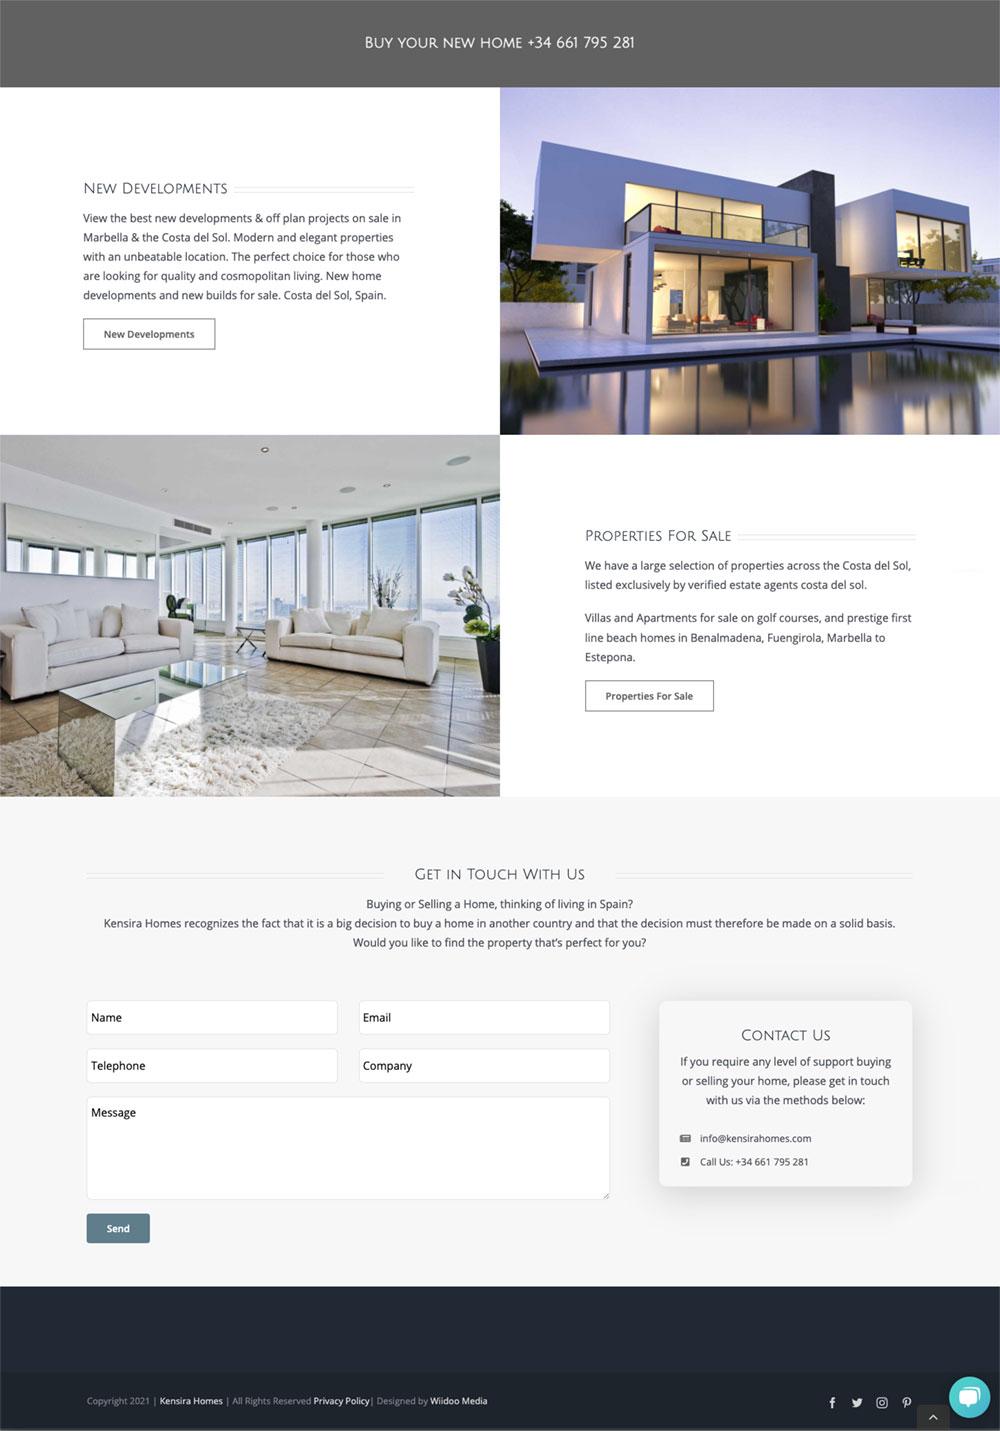 Kensira homes the best new developments costa del sol kensira homes Danish estate agents